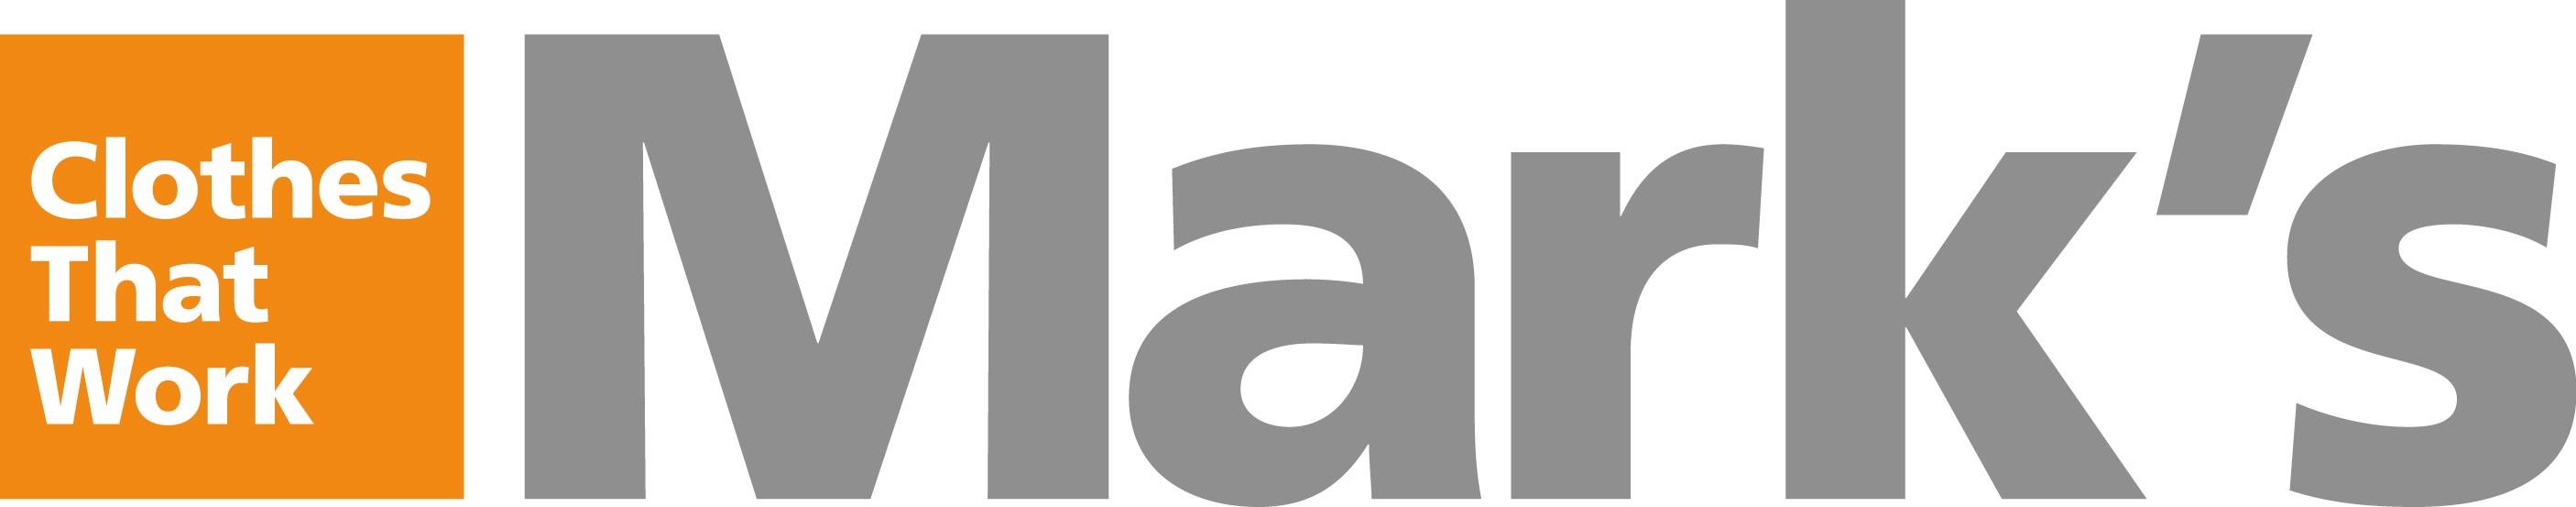 Marks.com Coupon Codes